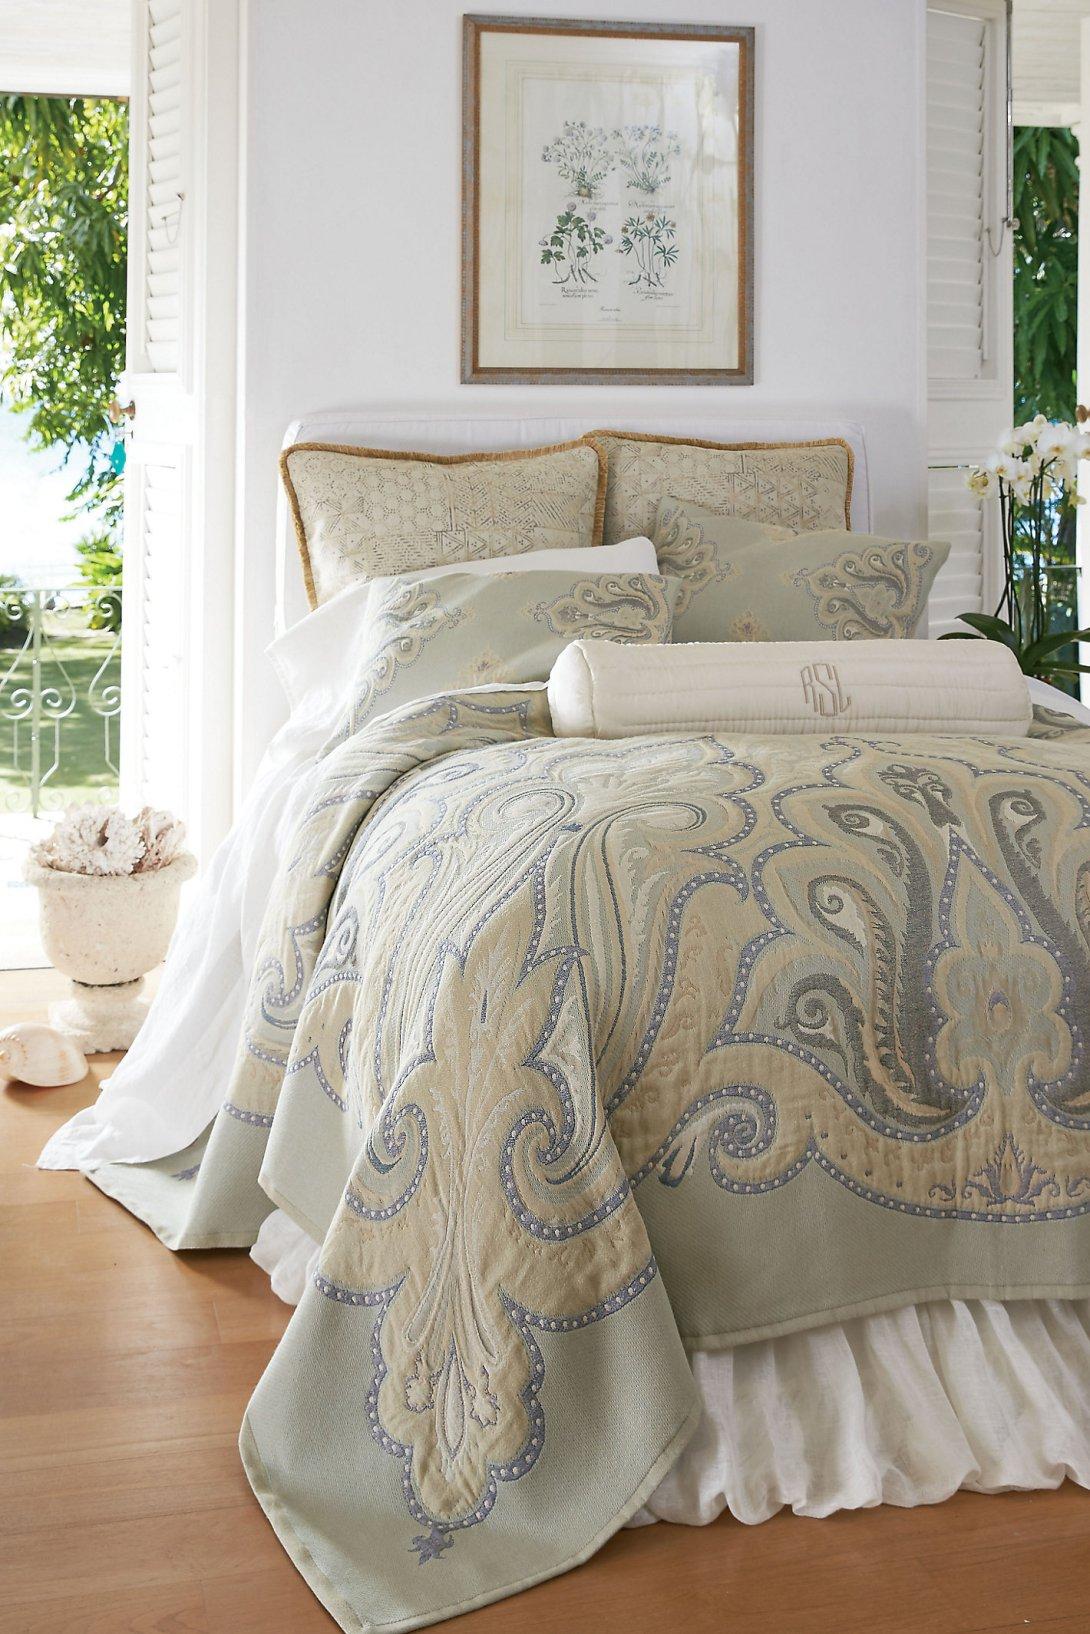 Soft Surroundings Home Decor Women S Clothing Buyer Select